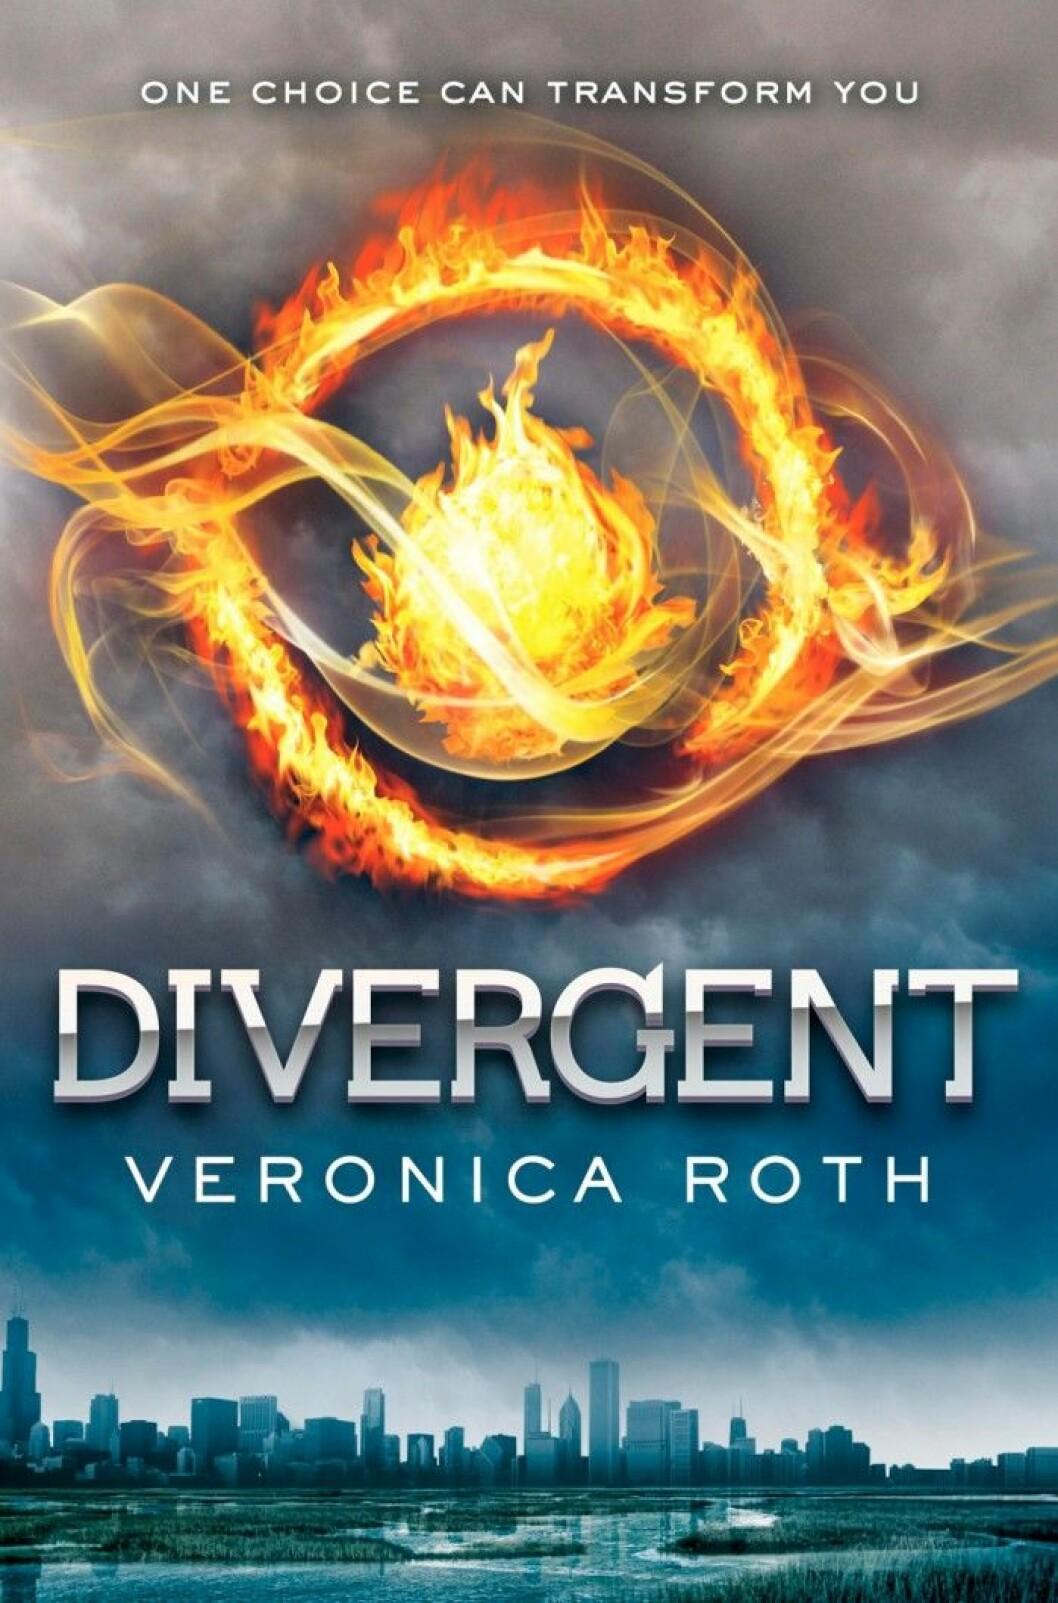 Divergent av Veronica Roth (Modernista)